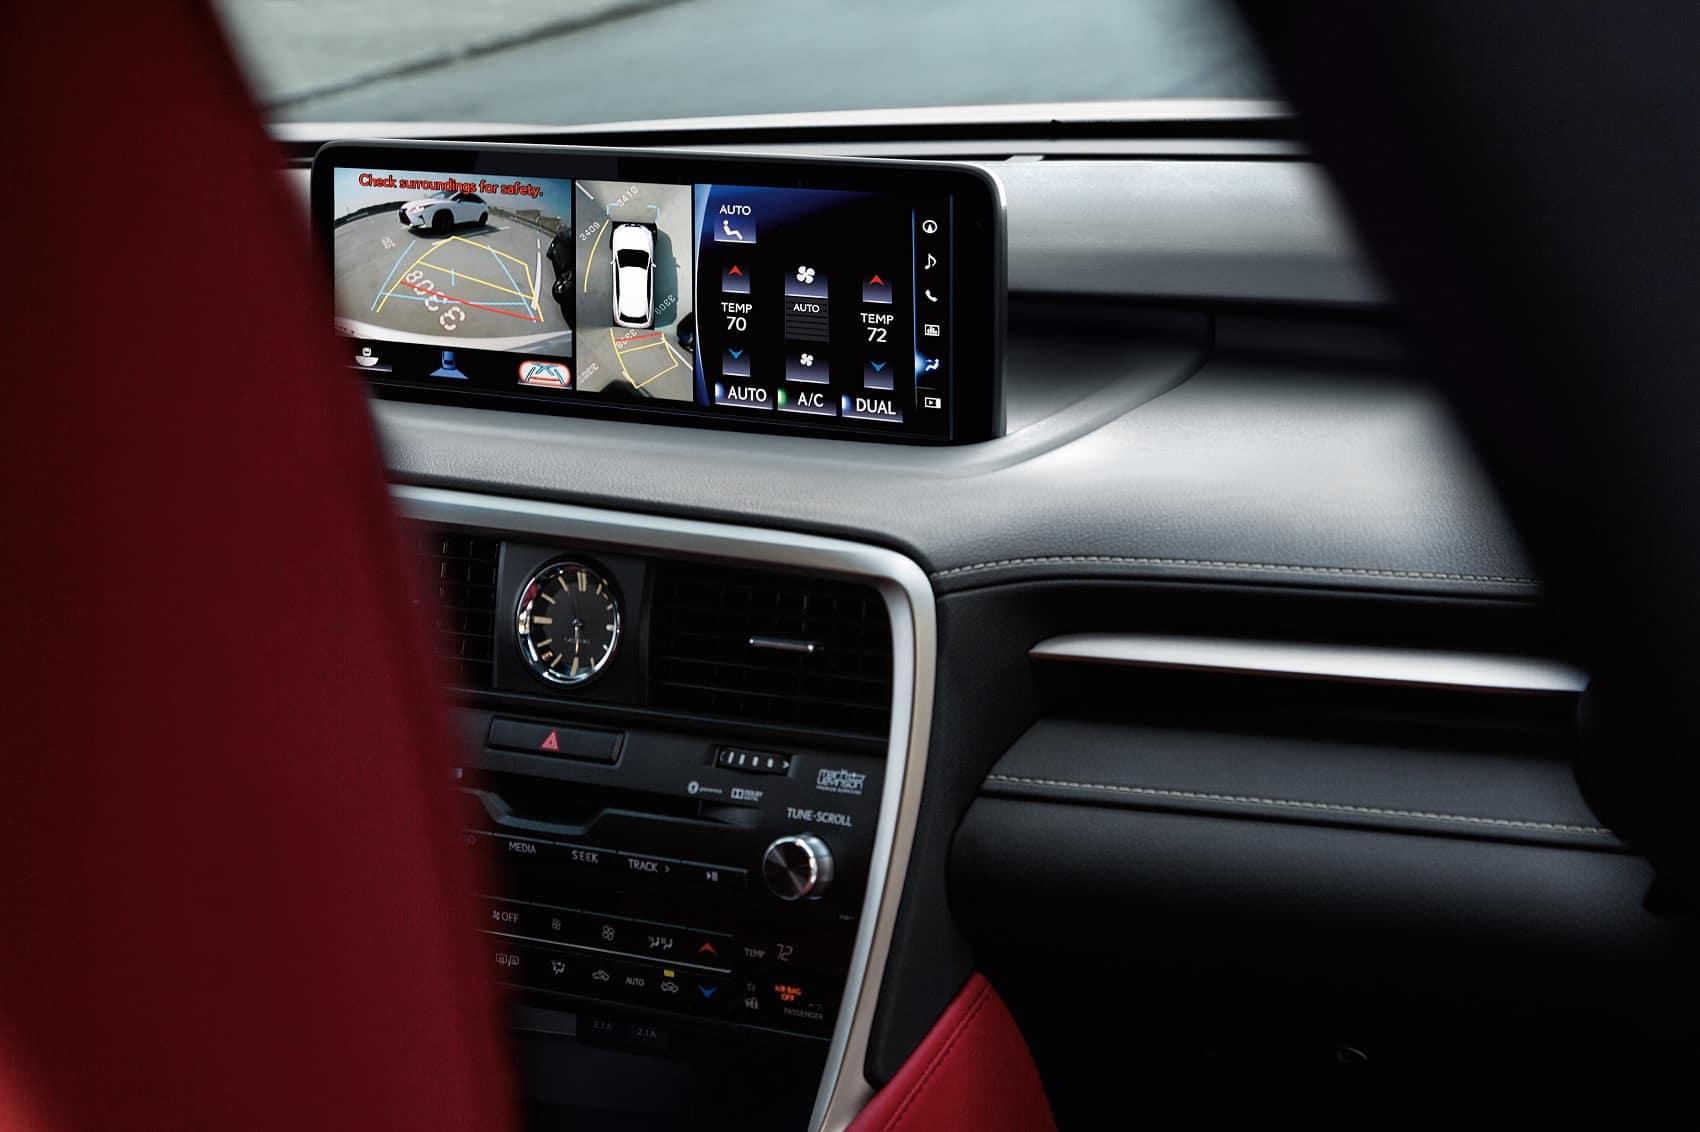 2021 Lexus UX Hybrid top view camera system